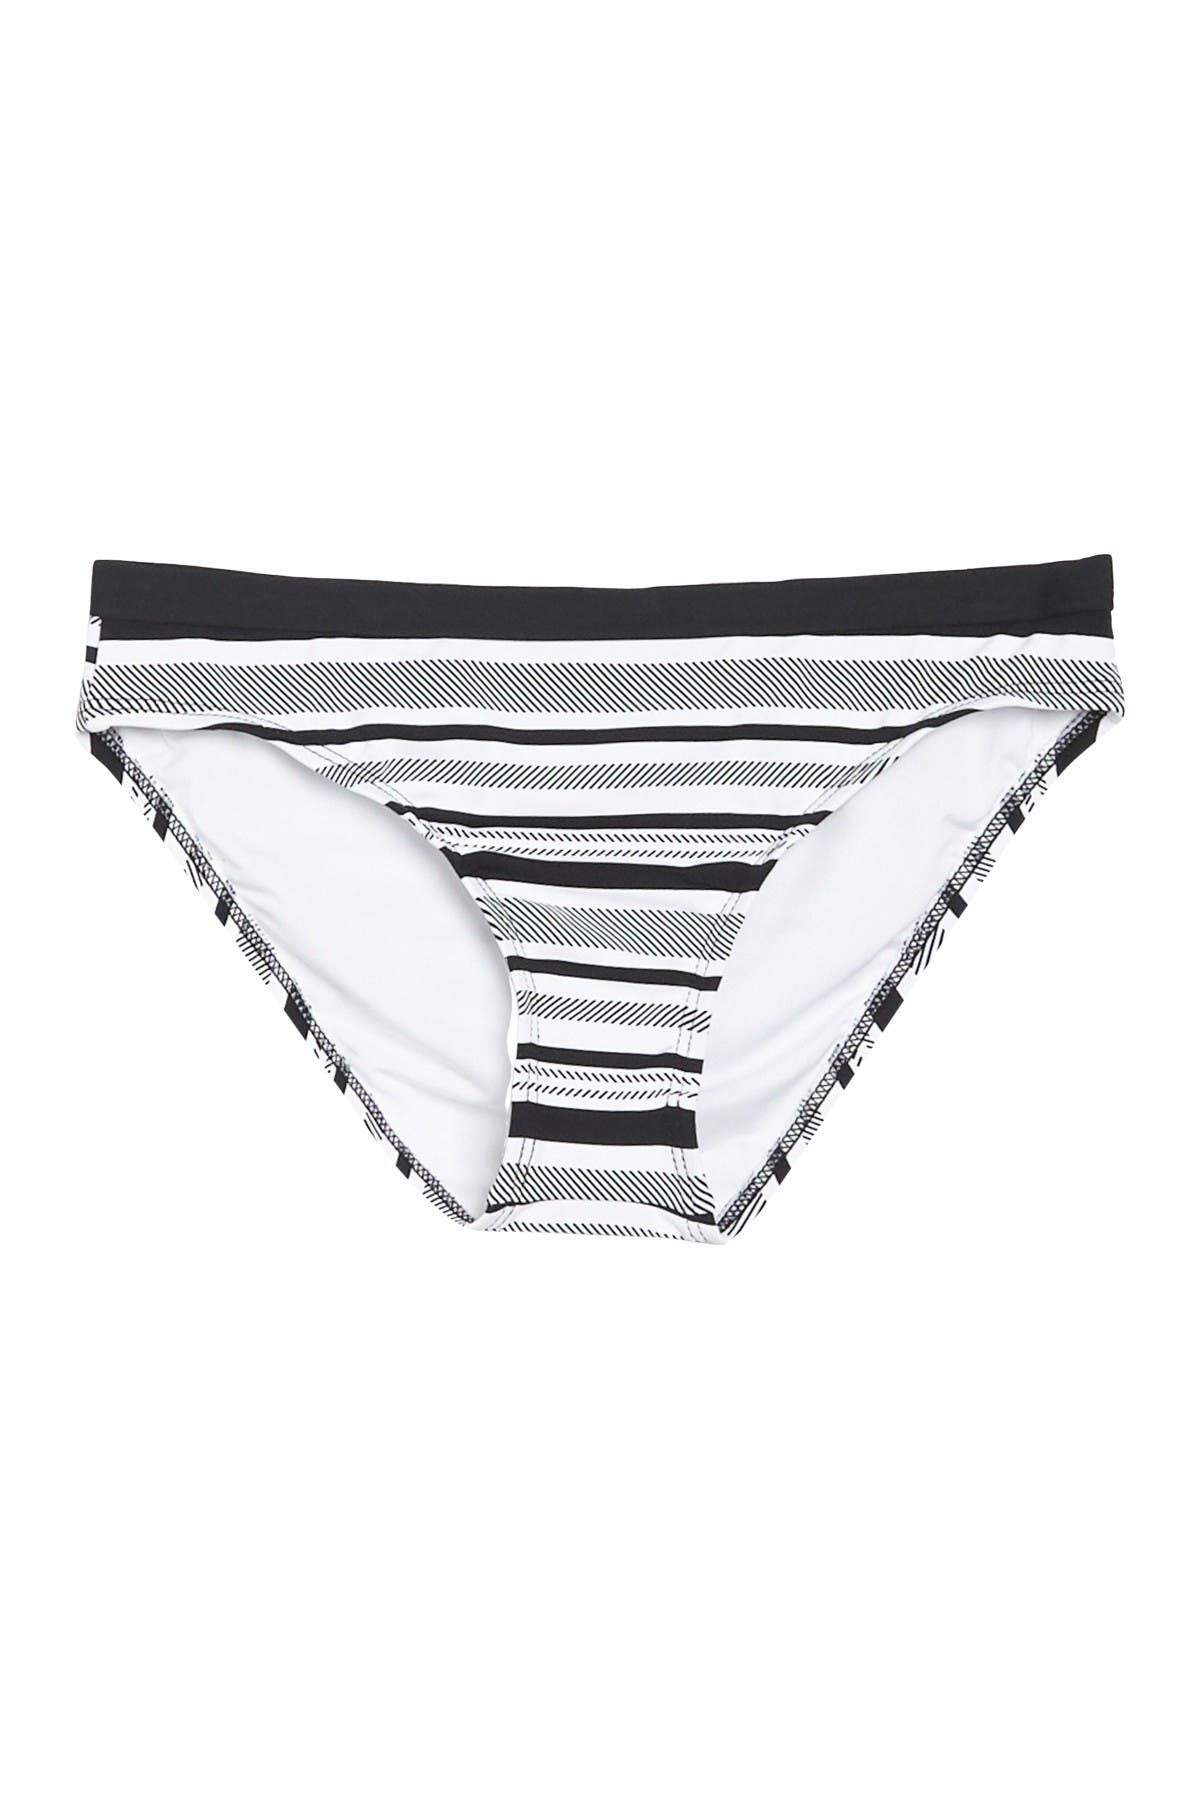 Image of NEXT Limitless Stripe Bikini Bottoms